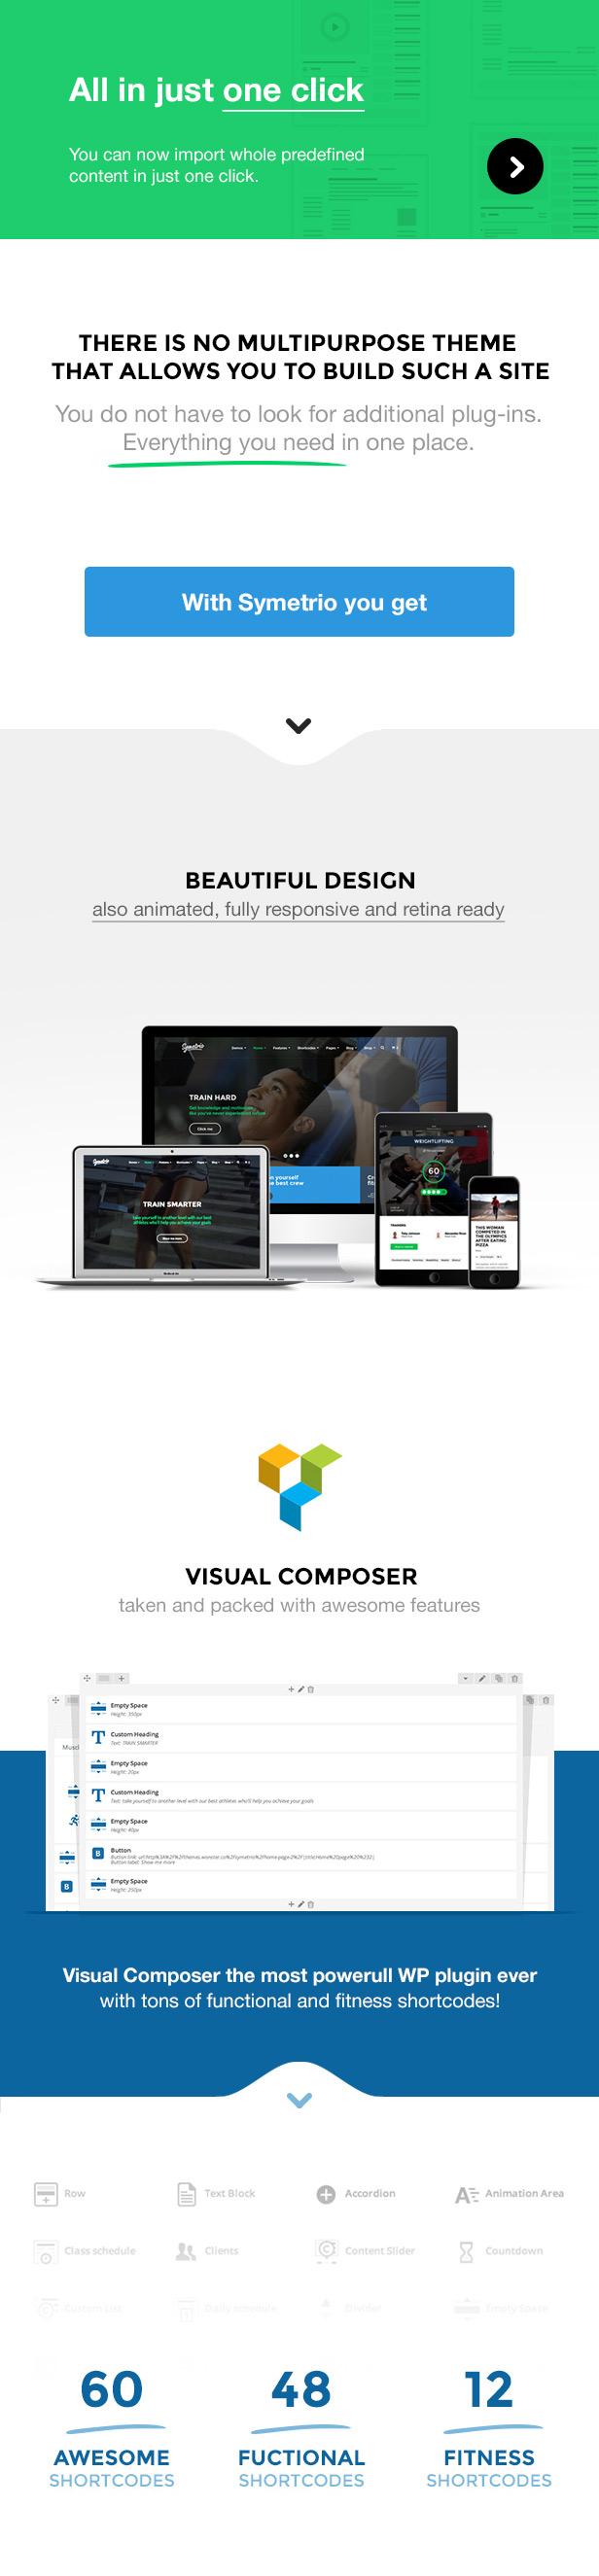 Symetrio - سمة WordPress للجيم واللياقة البدنية - 2